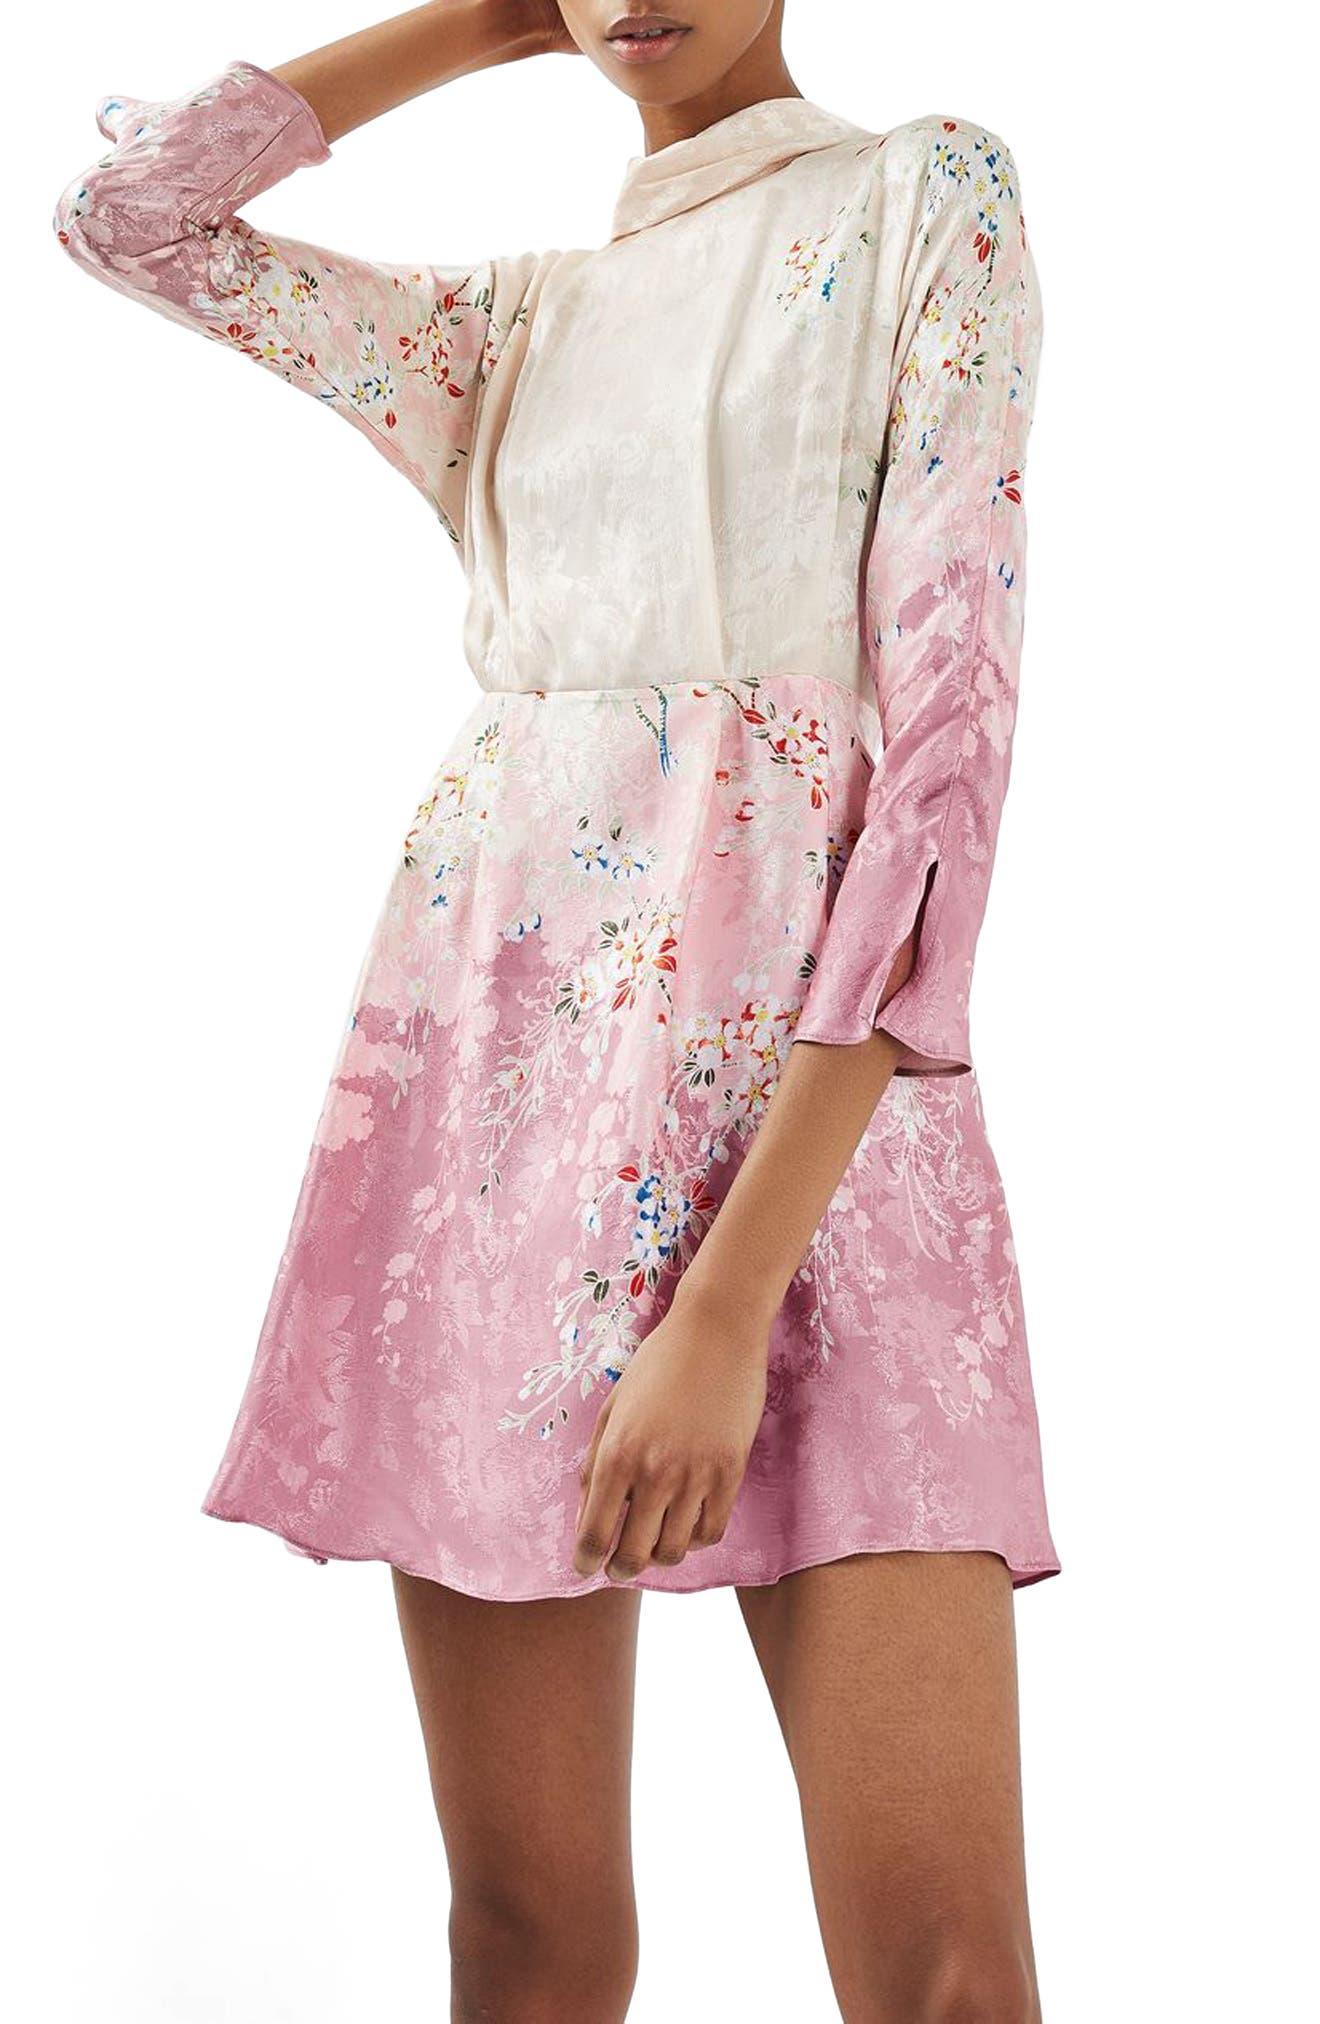 Main Image - Topshop Jacquard Floral Print Dress